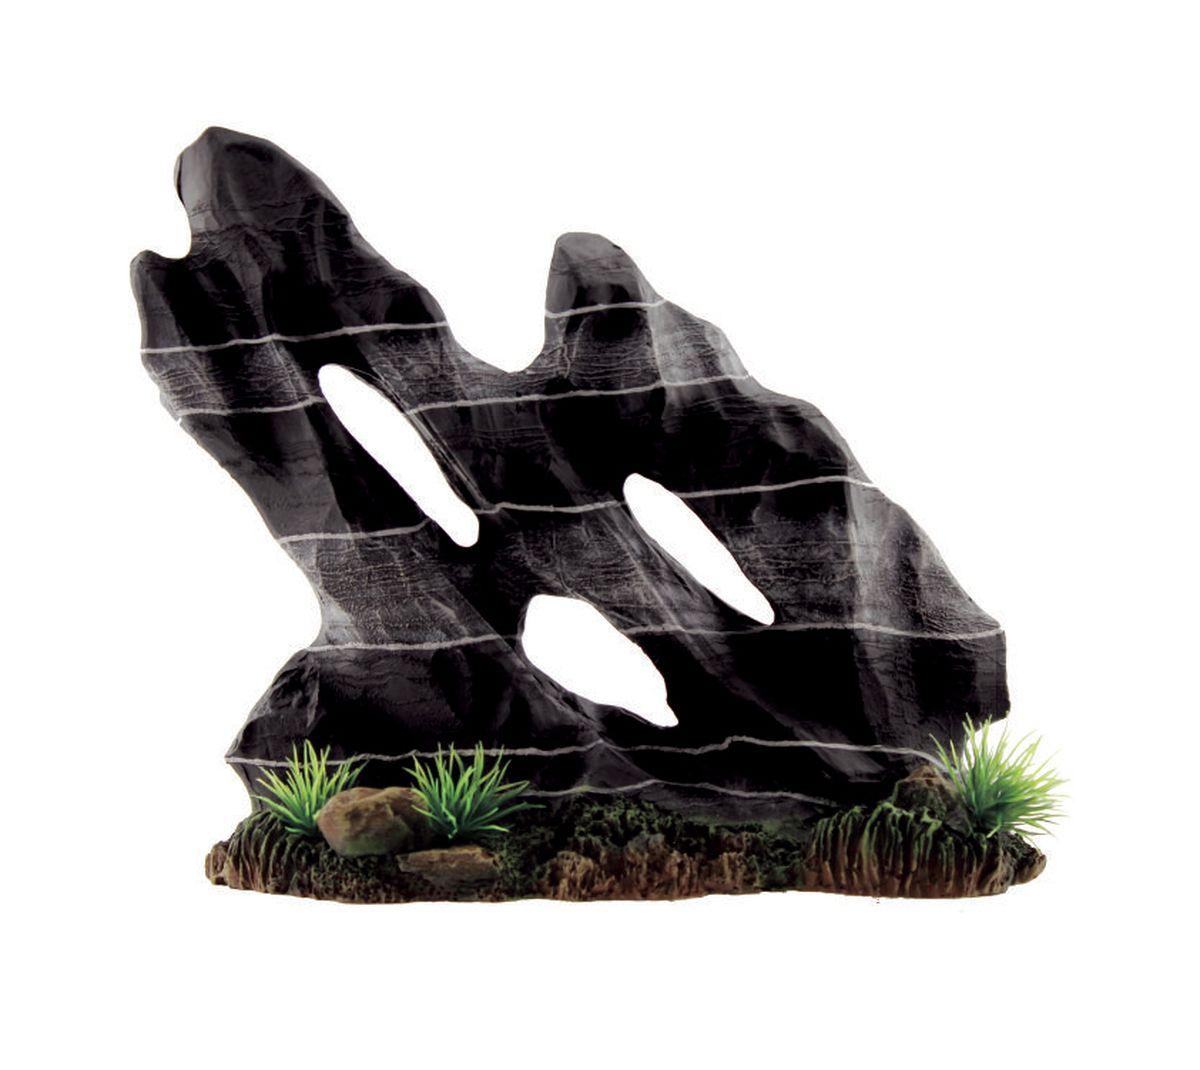 Декорация для аквариума ArtUniq Каменная скульптура, 23 x 8 x 19,5 смART-3115100Декорация для аквариума ArtUniq Каменная скульптура, 23 x 8 x 19,5 см